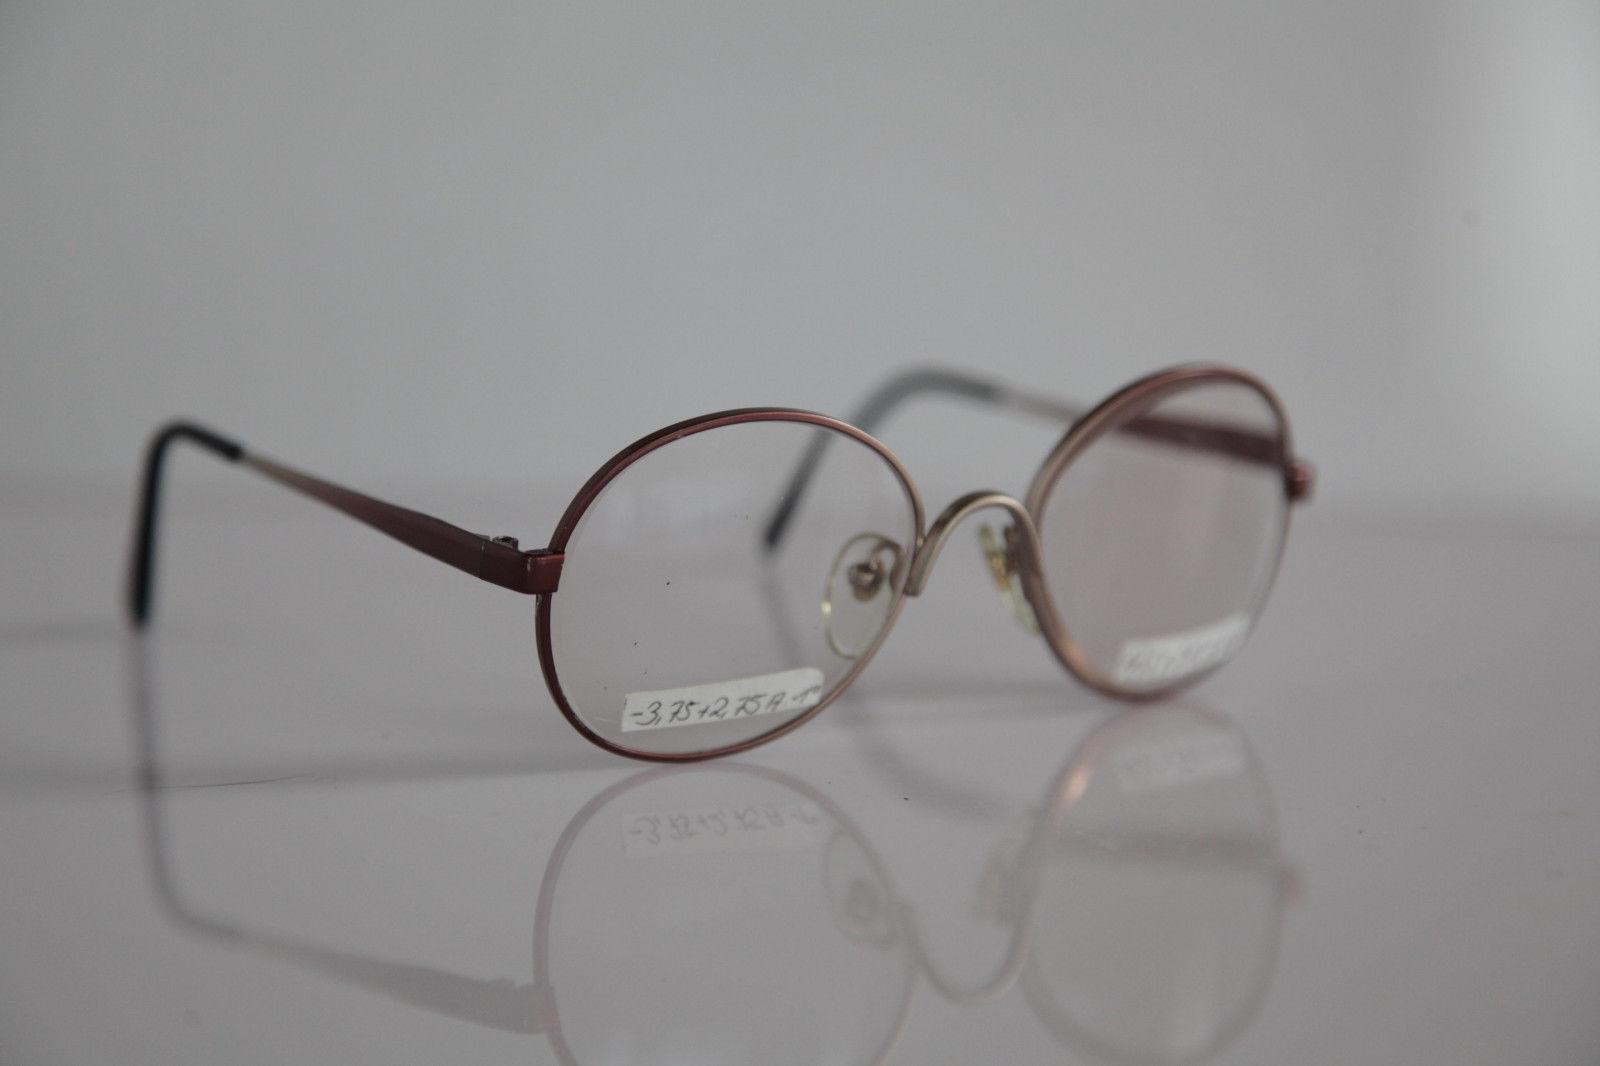 Vintage Eyewear,  Grading Metallic Red Frame,  RX-Able Prescription lens.